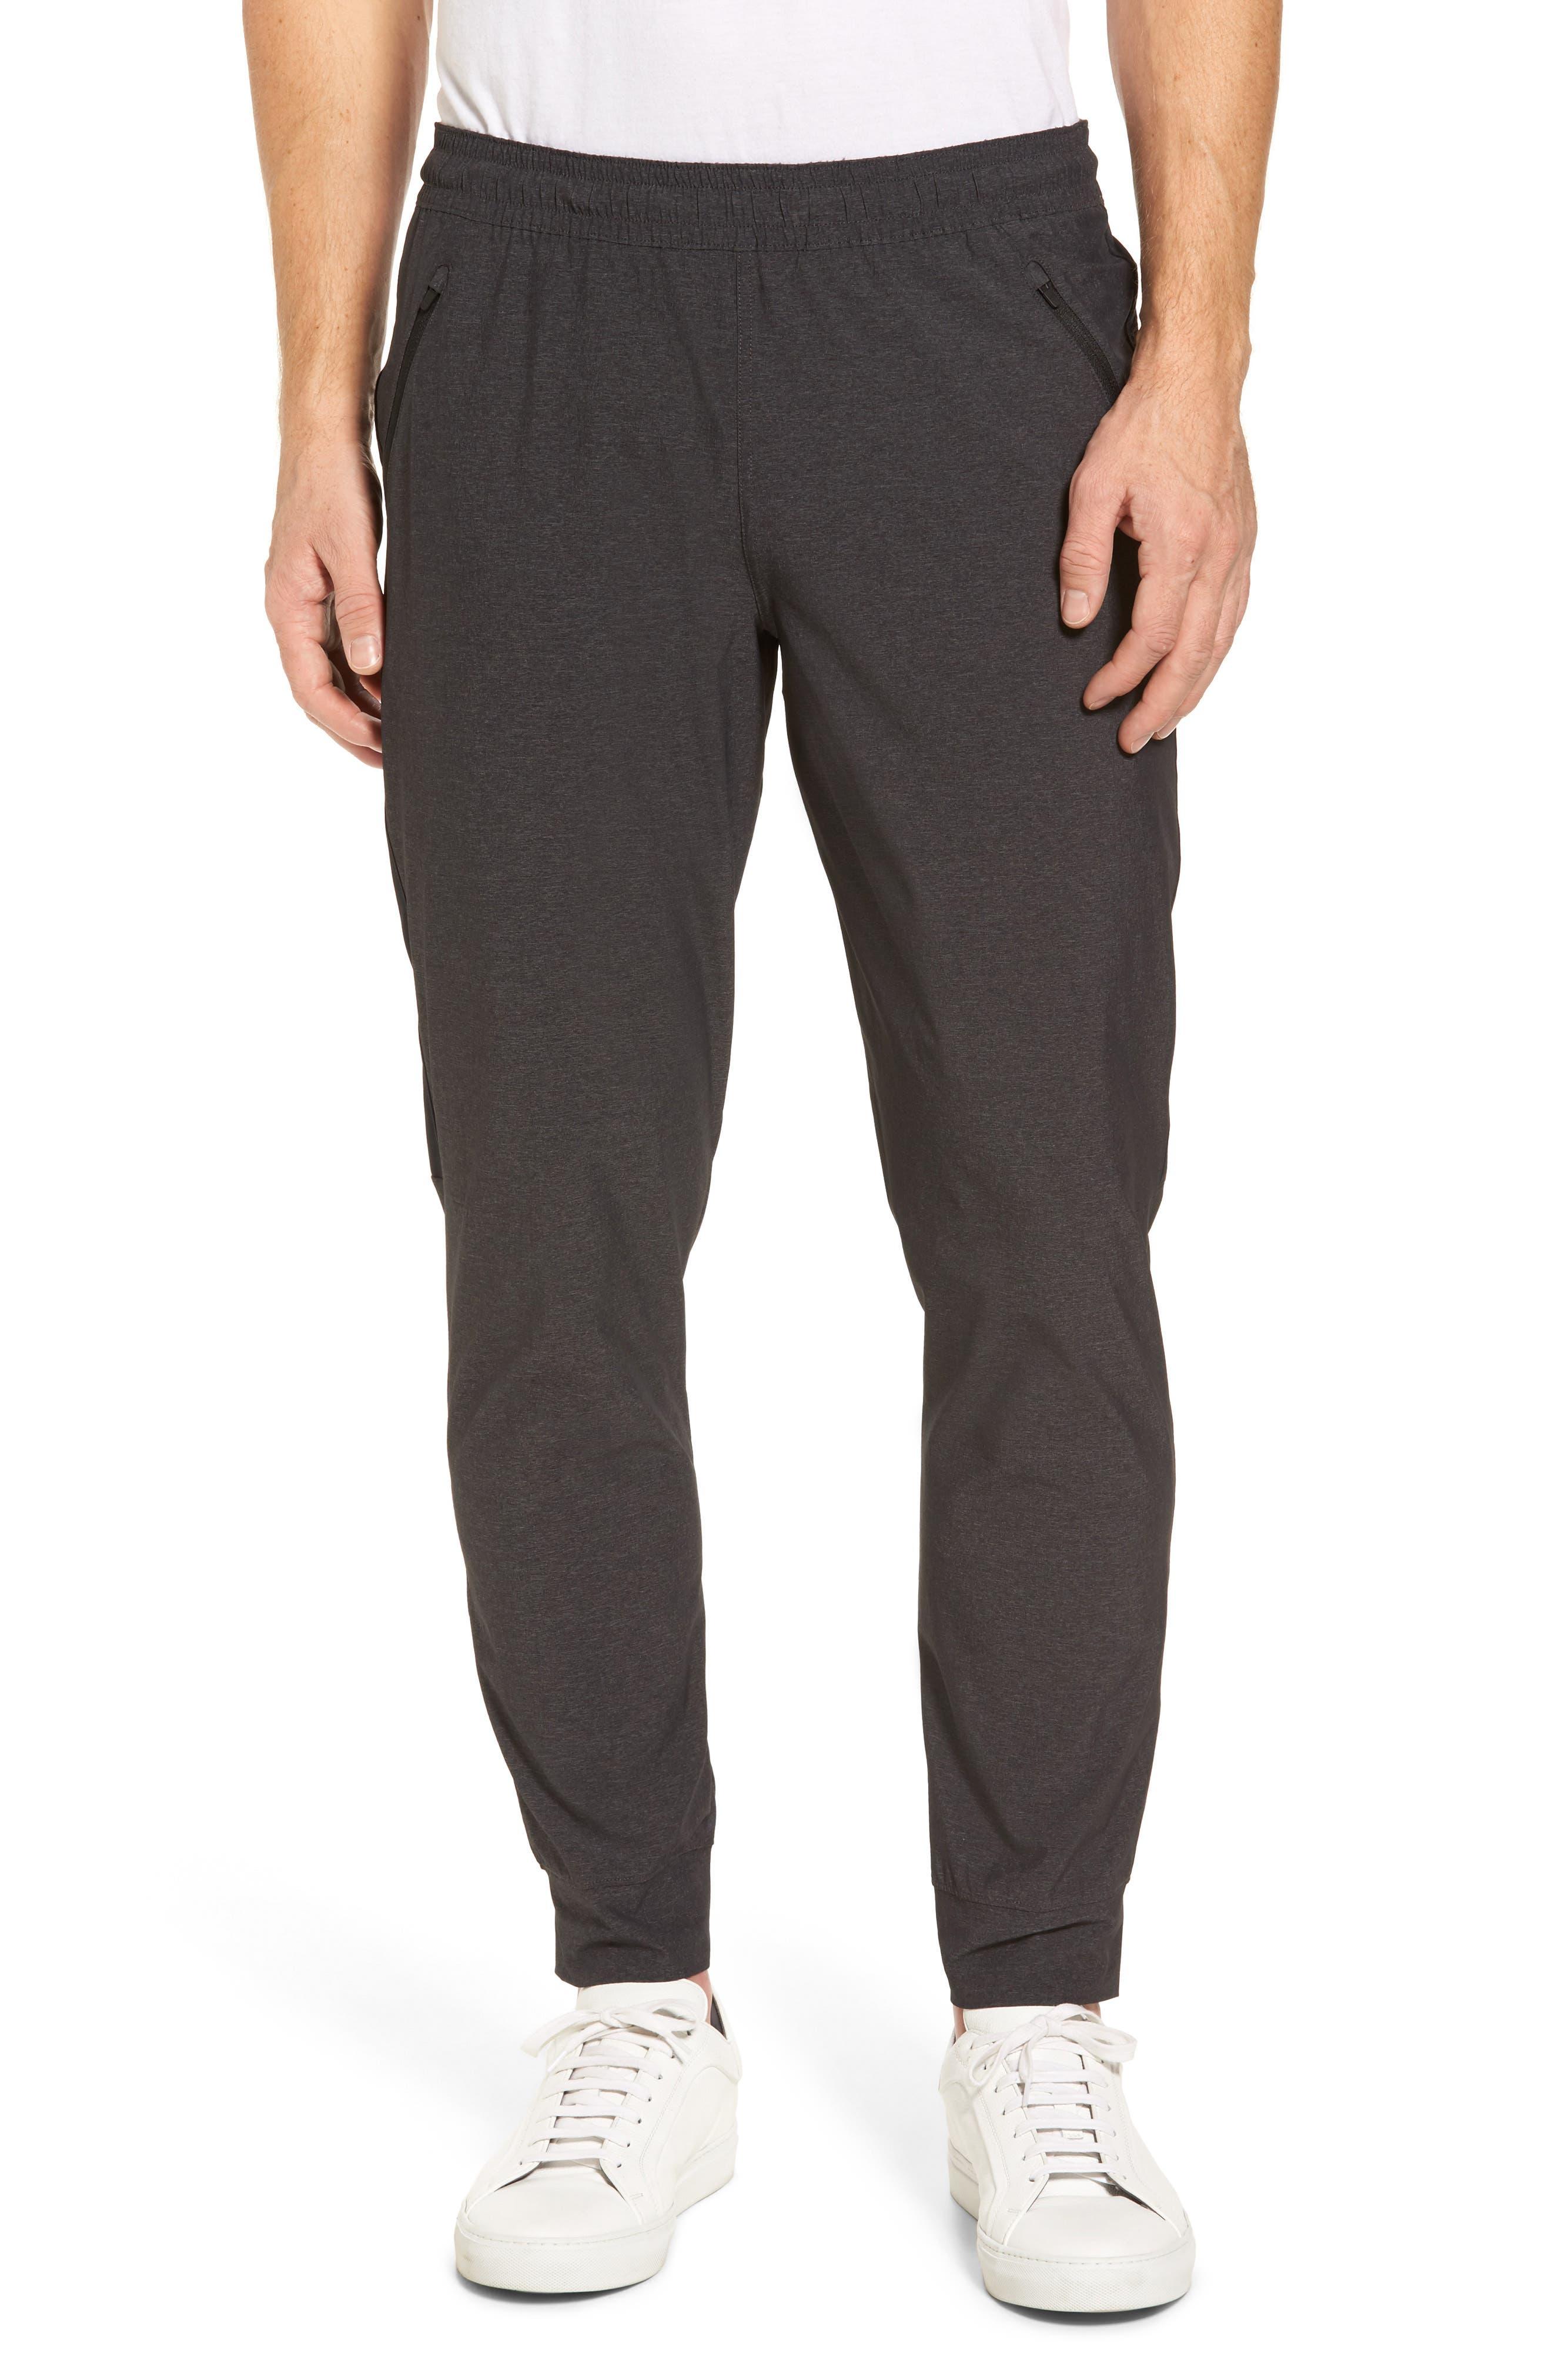 Zip Pocket Sweatpants,                         Main,                         color, Grey Ebony Melange